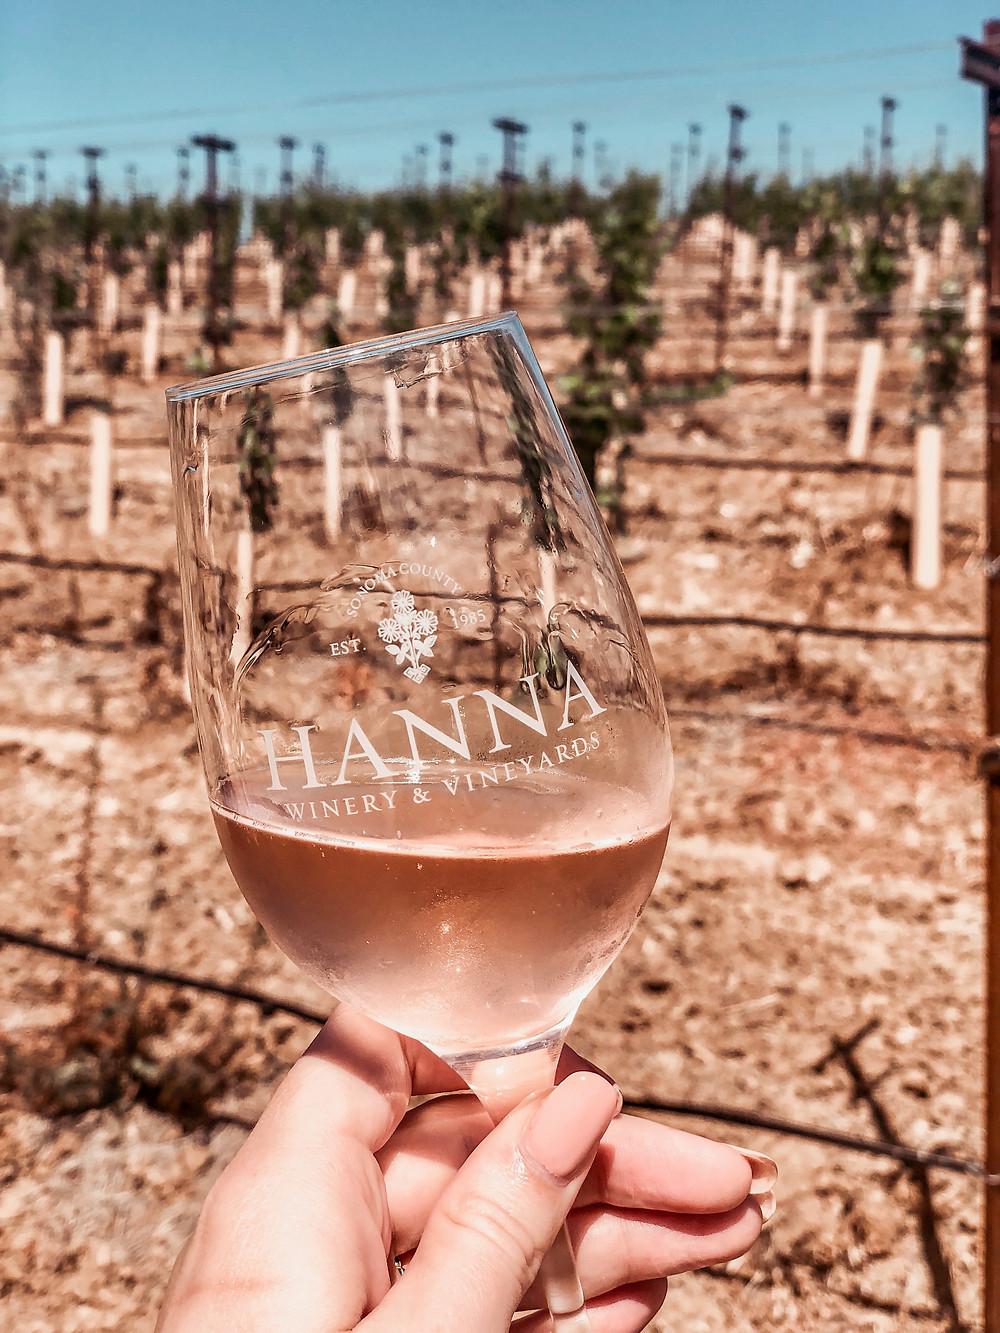 Sonoma Grape Girl, Audra Tavelli, alexander valley, experience alexander valley, sonoma county, sonoma county wine event, healdsburg event, healdsburg wine event, sonoma county blogger, alexander valley wine tasting, alexander valley wineries, hanna, hanna vineyards